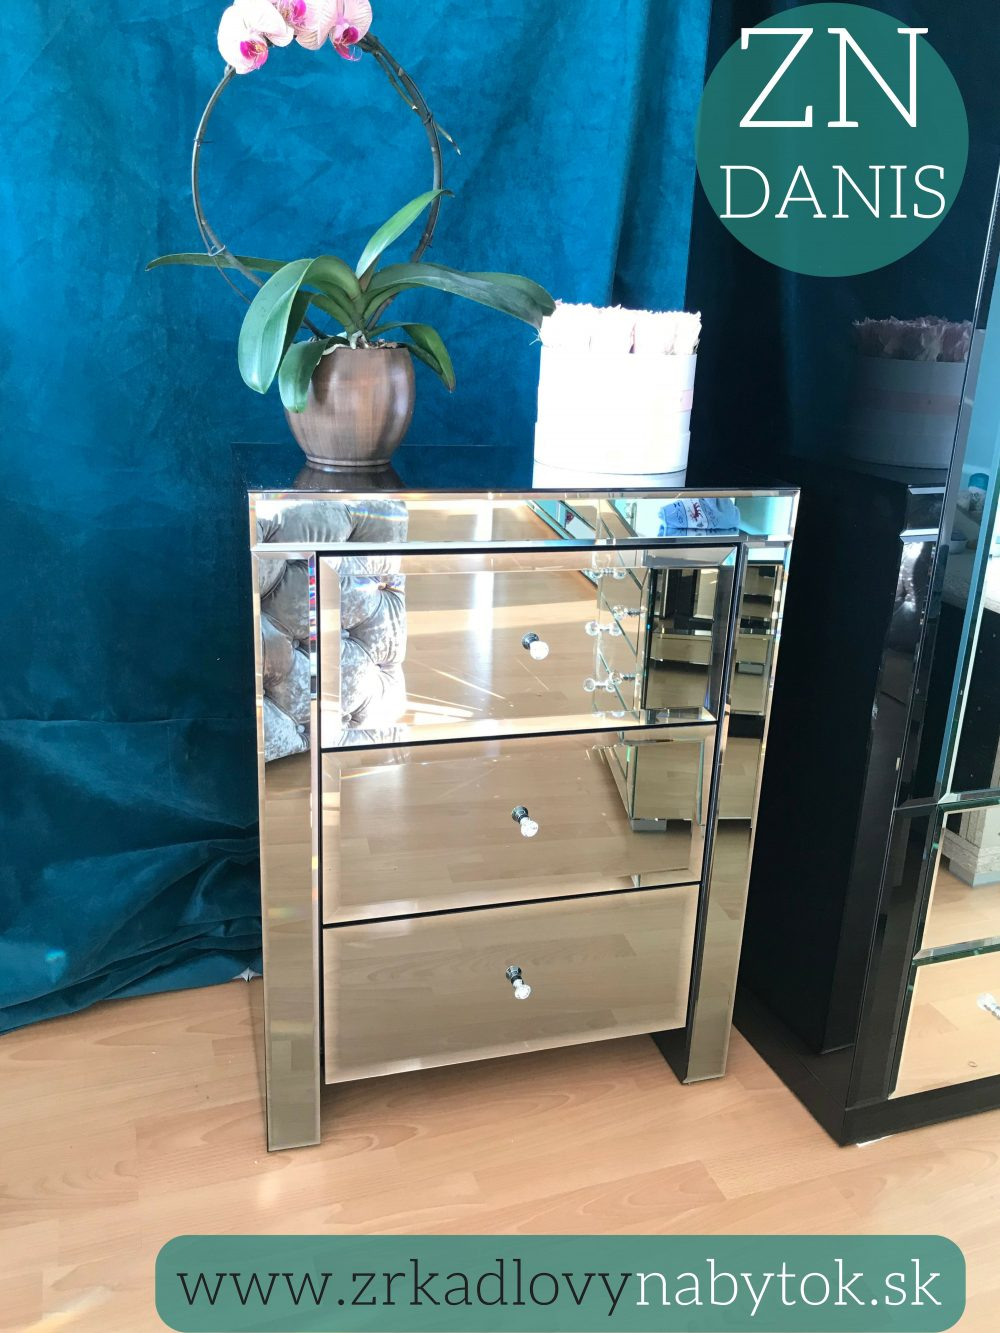 ZNDANIS-173-min